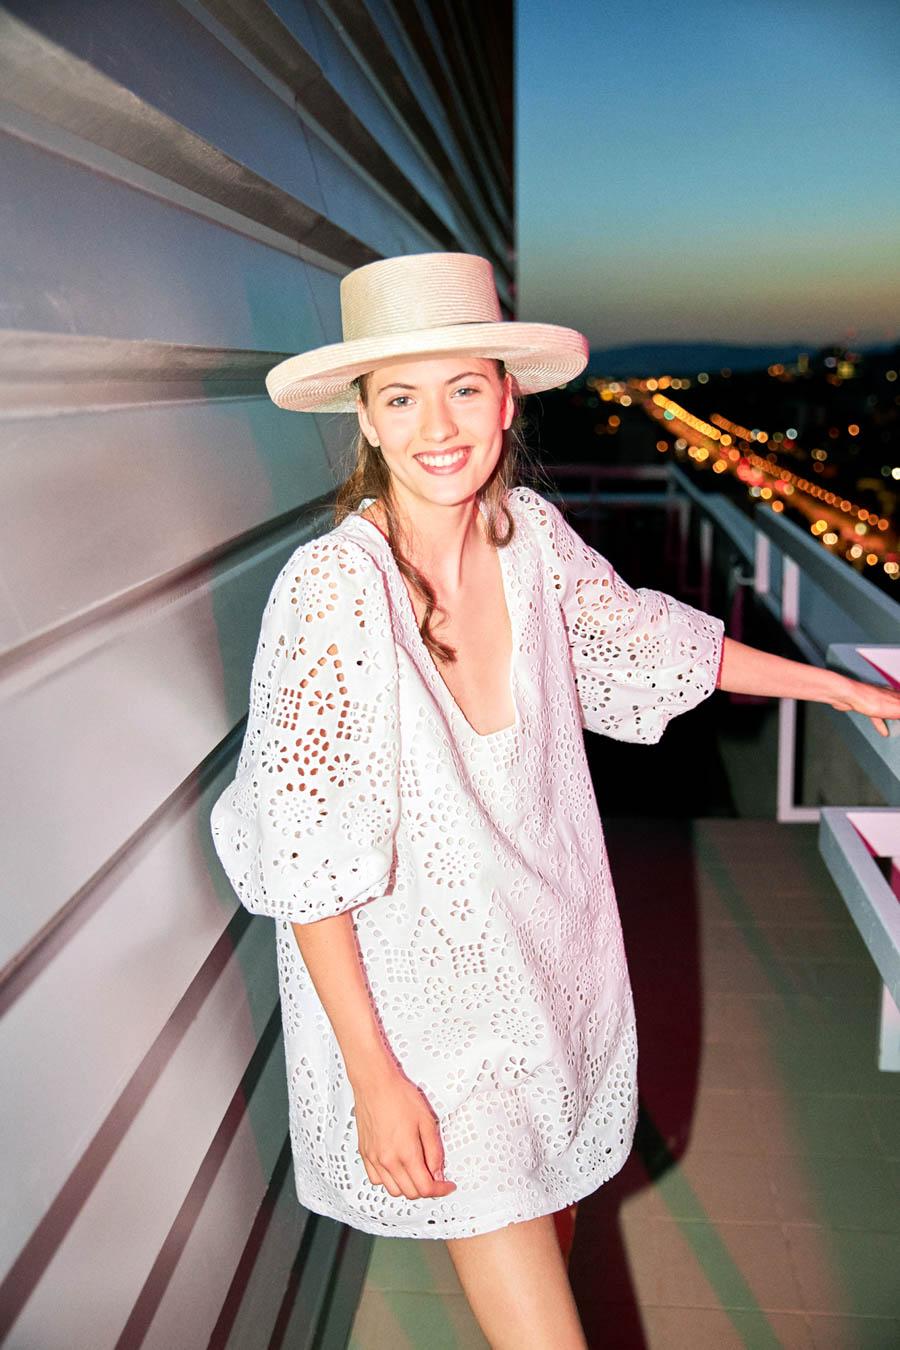 vestido novia sencillo boda blog a todo confetti marta marti barcelona elegante corto civil segundo traje pantalon lencero